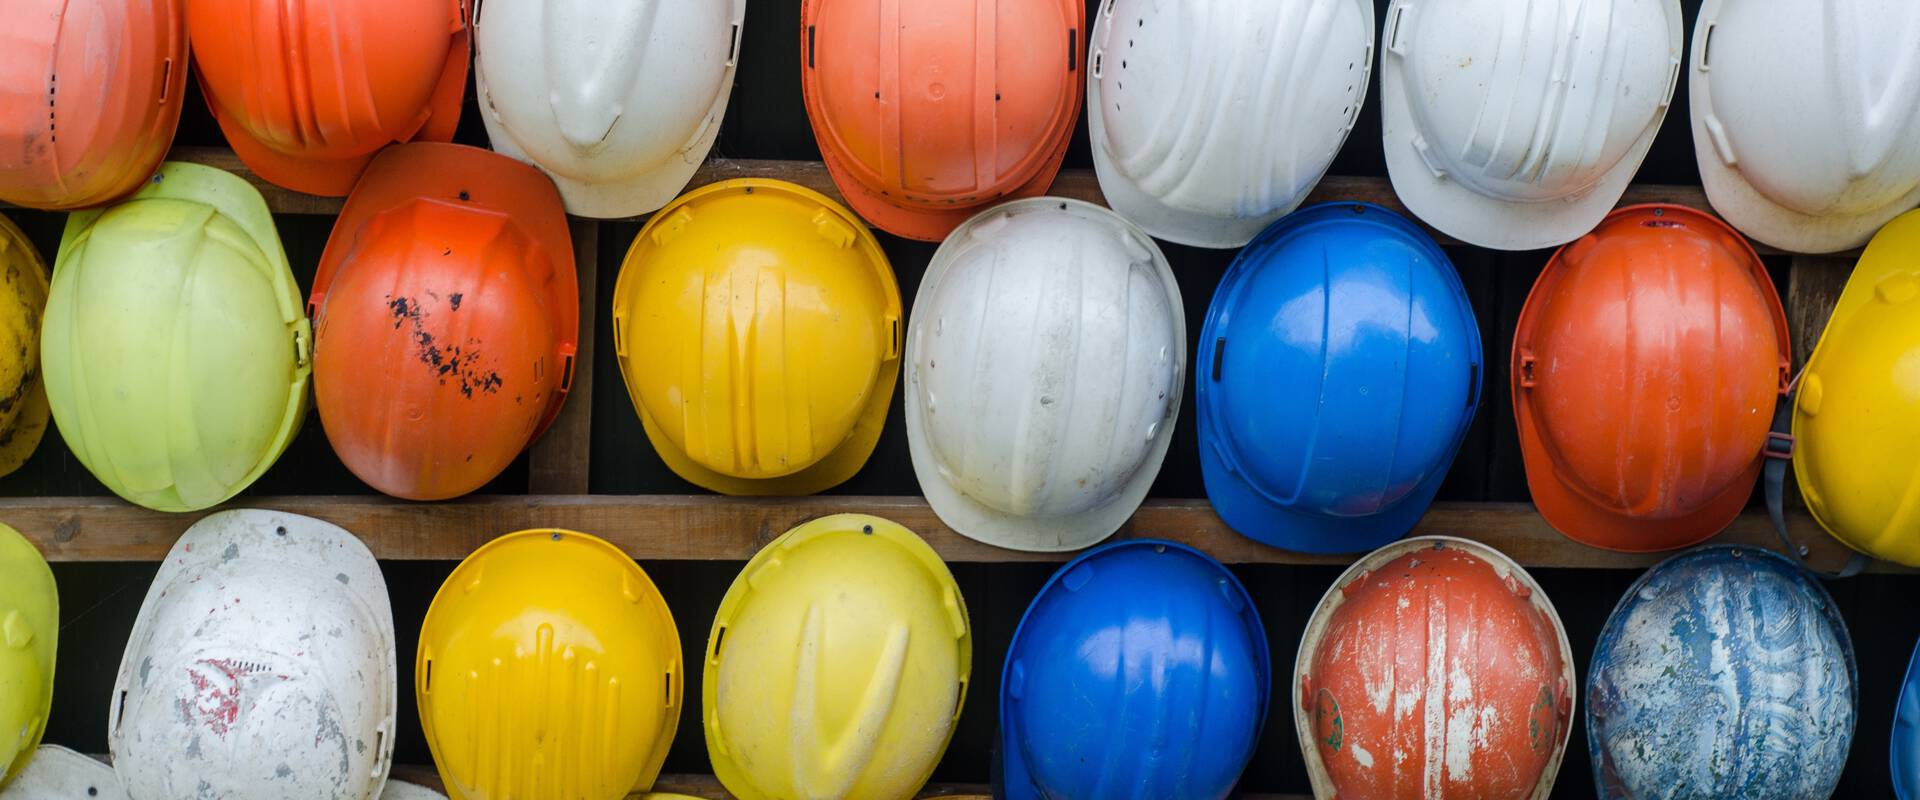 Construction Corner - August 2020